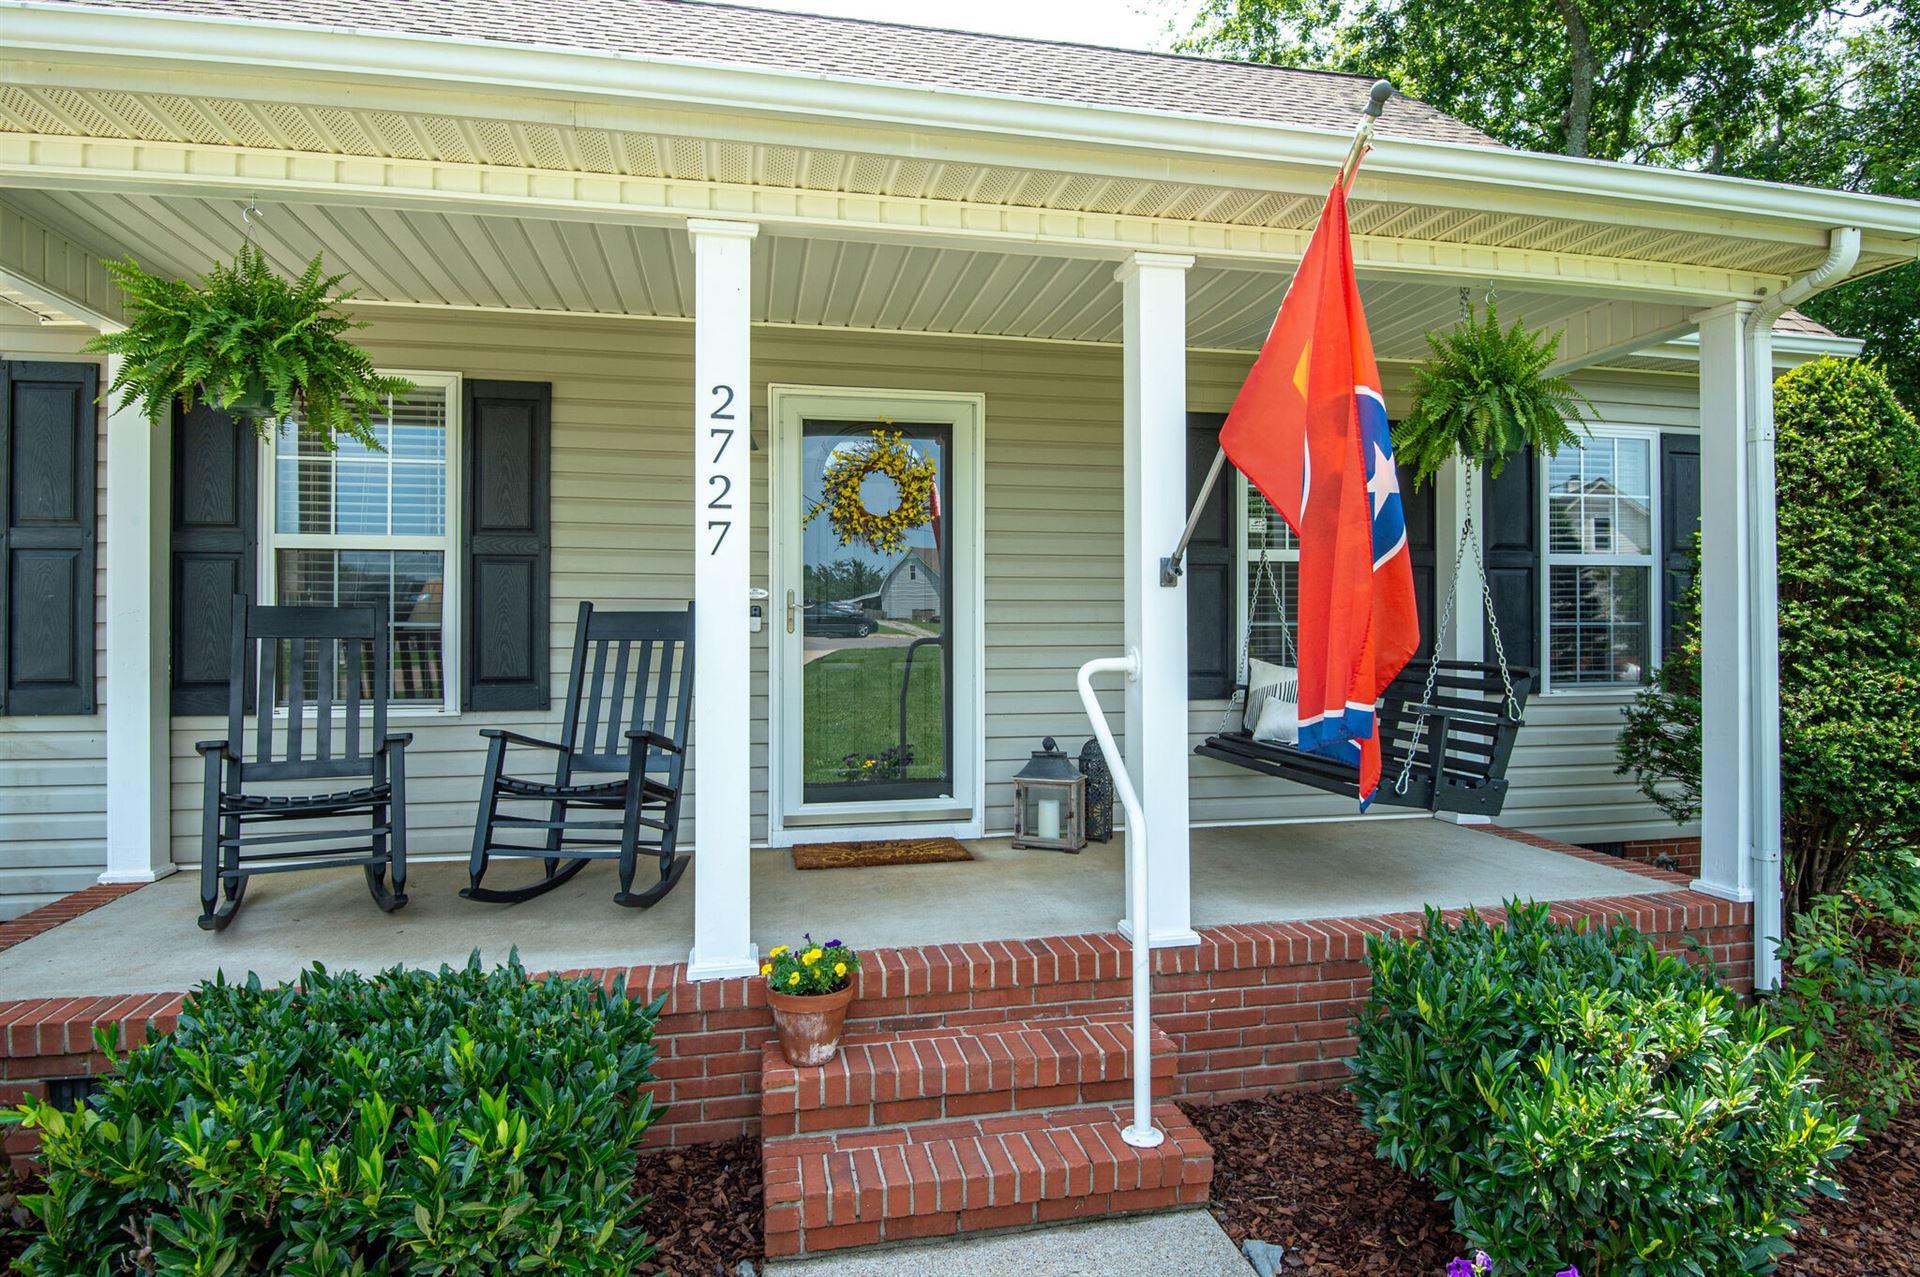 Photo of 2727 Zakary Ct, Spring Hill, TN 37174 (MLS # 2167656)